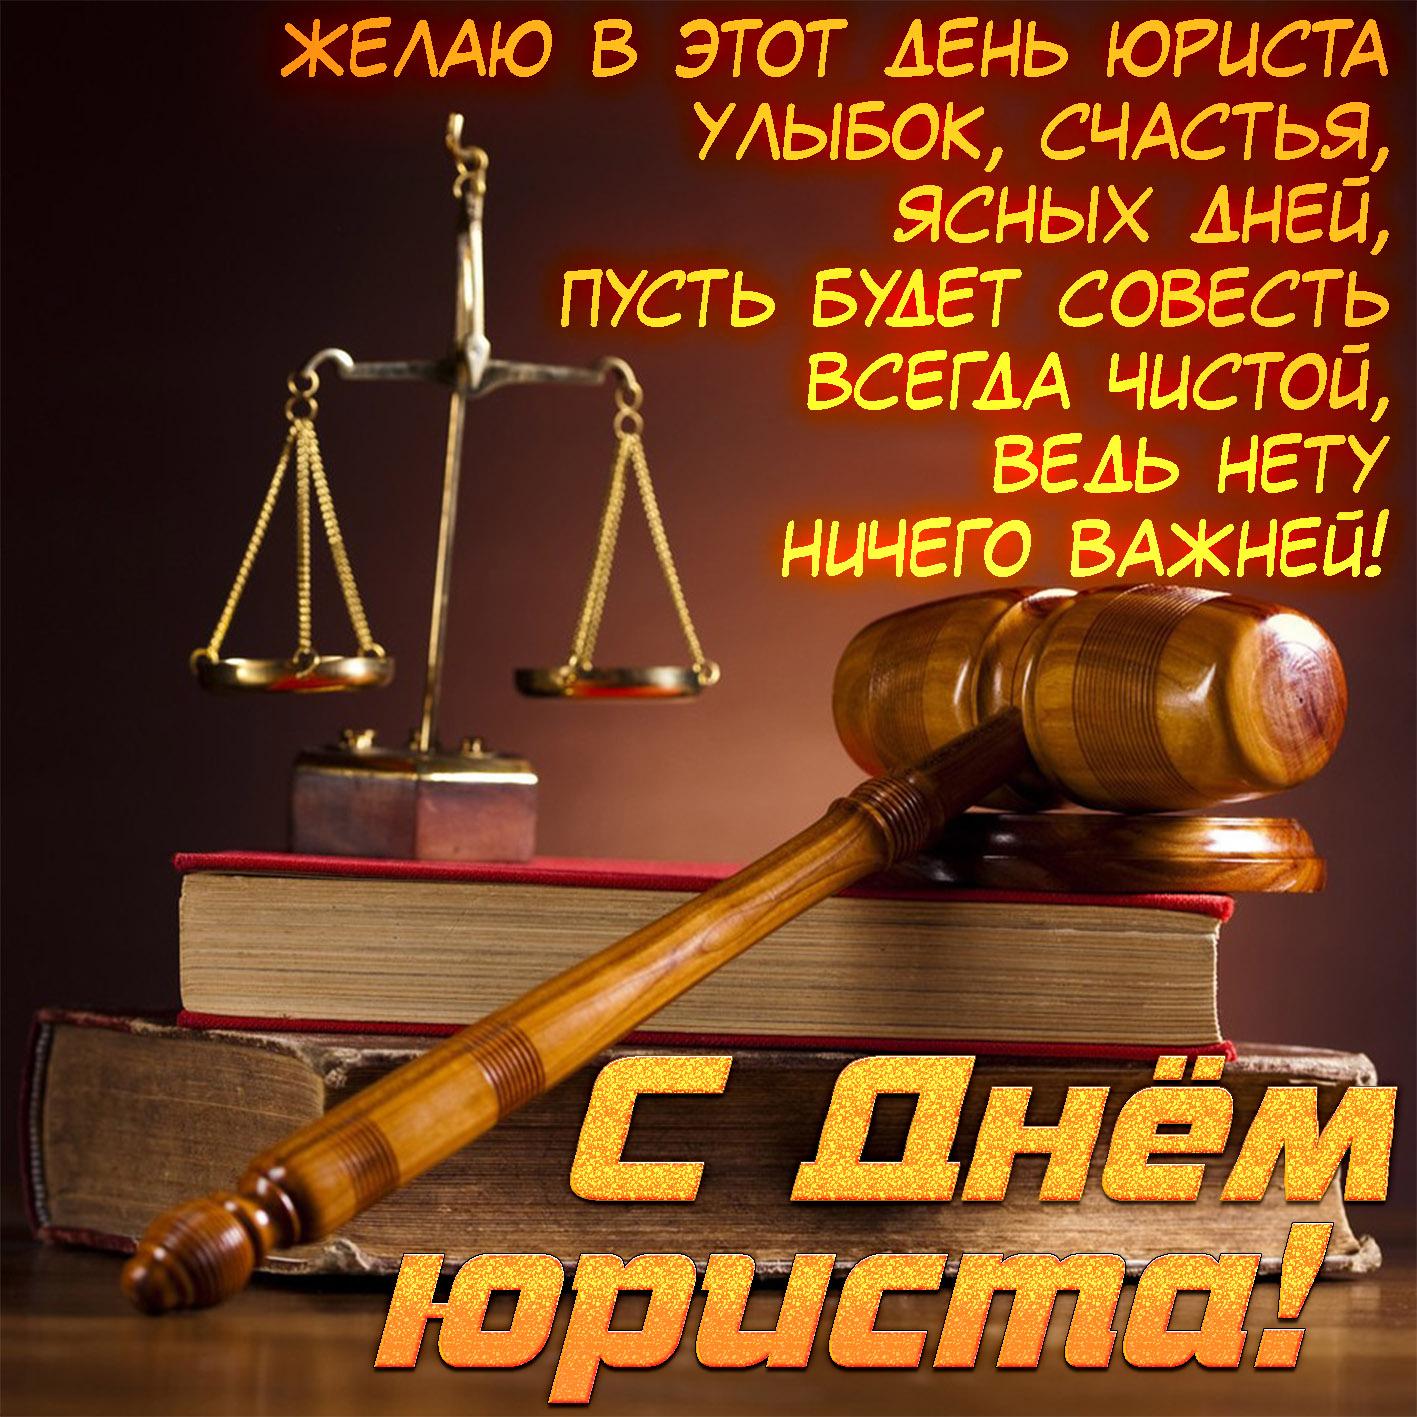 Открытка к юристам